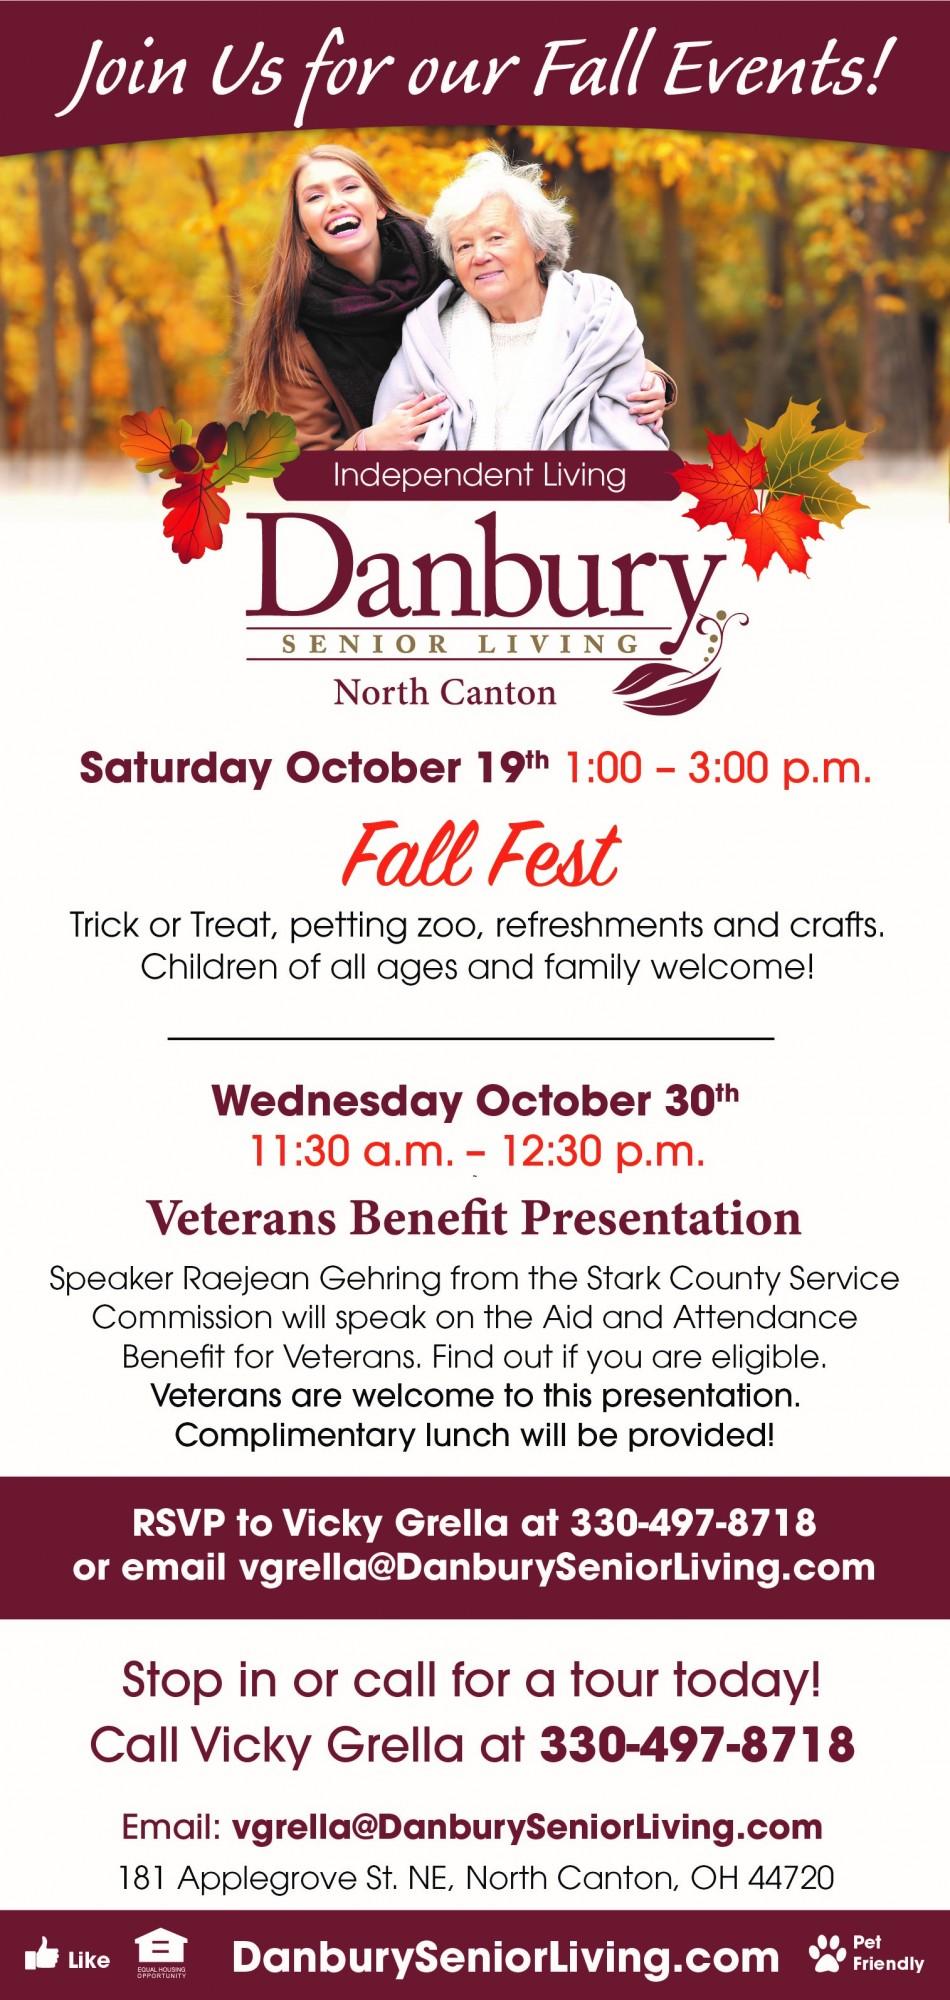 Fall Fest Danbury Assisted Living